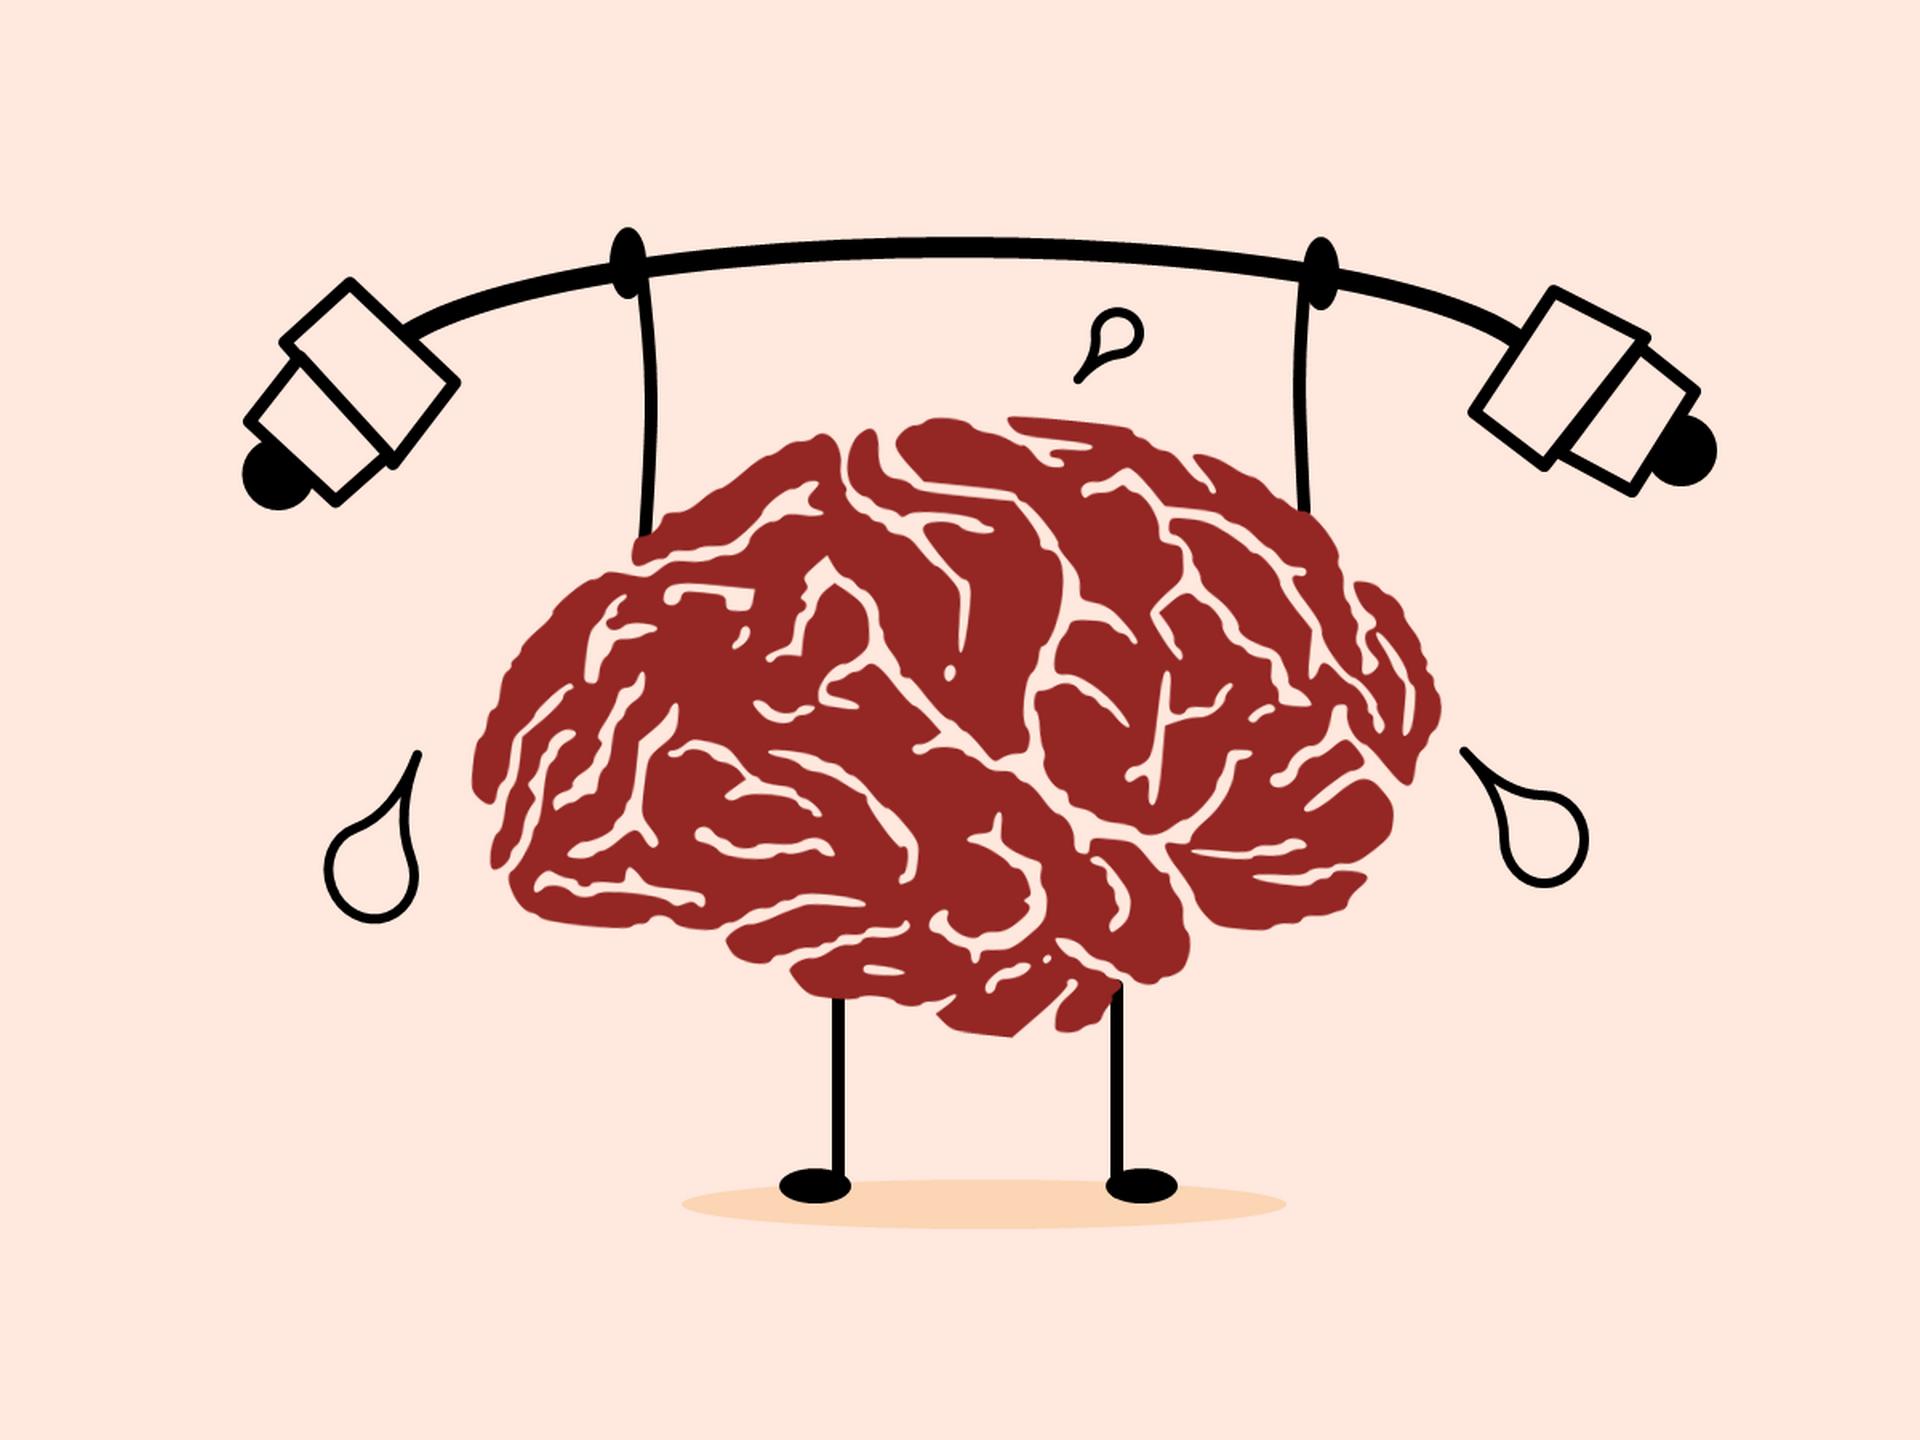 Inovacija srpskih naučnika prati ponašanje mozga